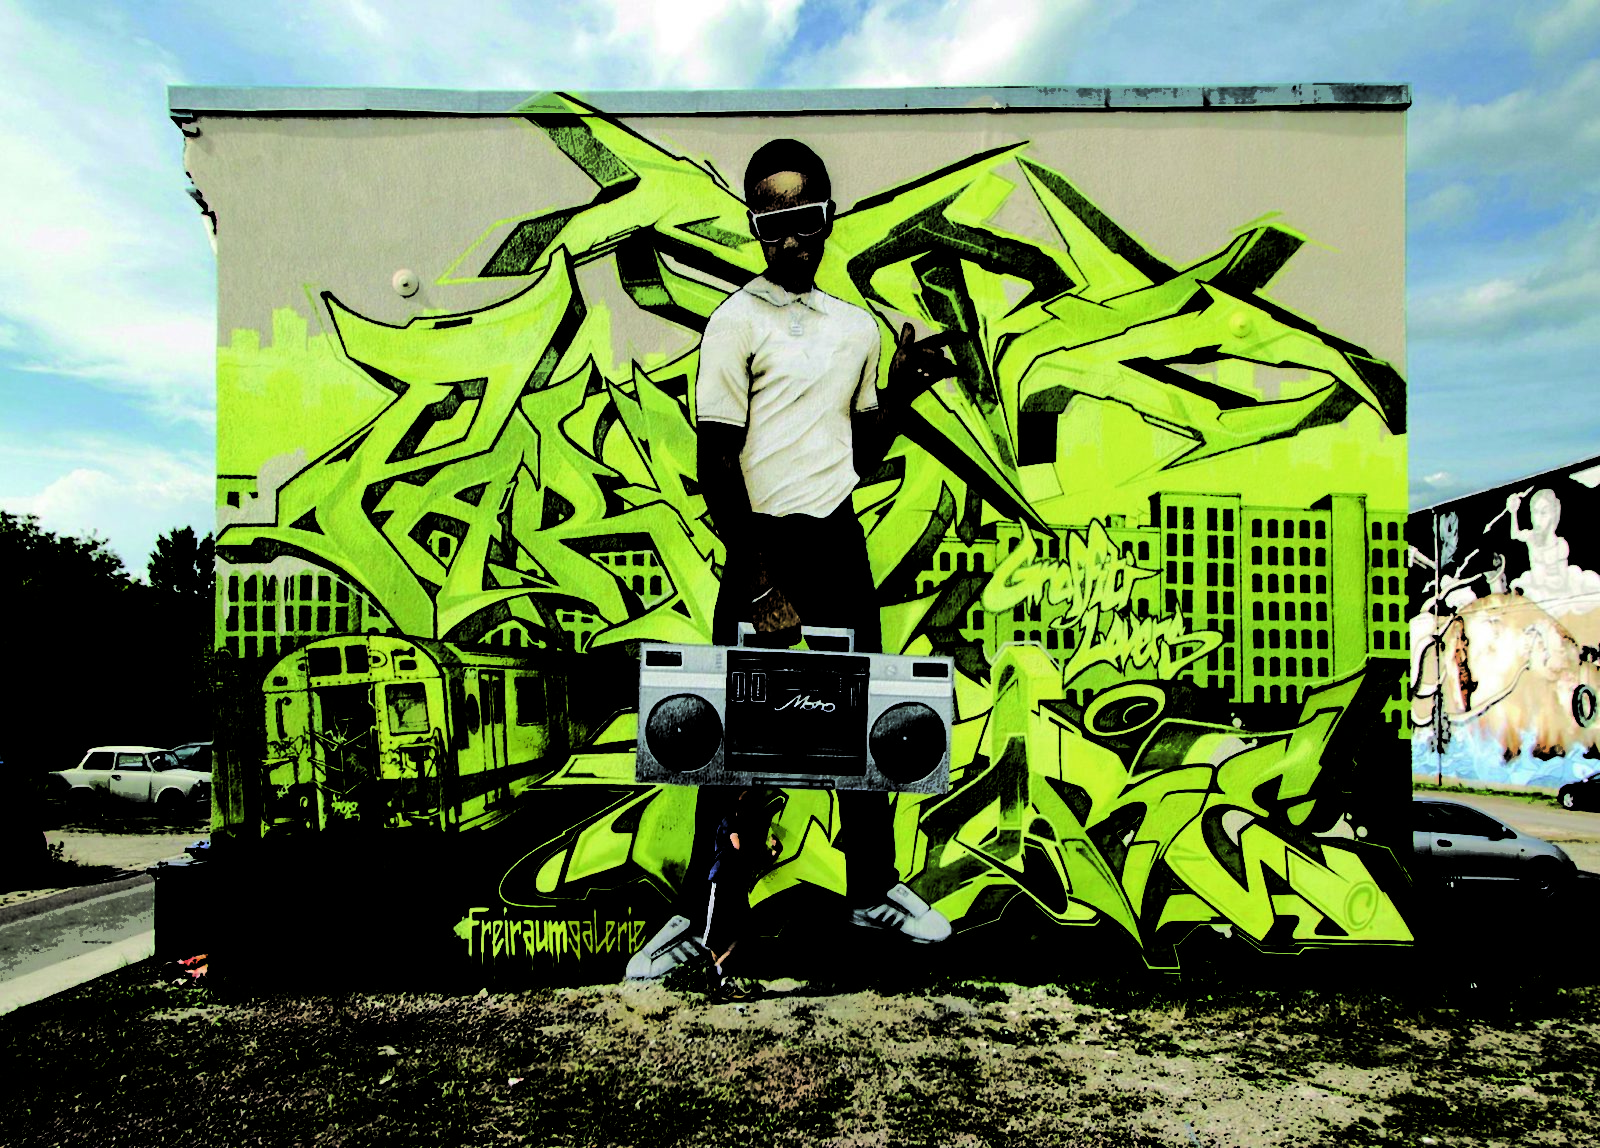 Halle ville allemande streetart fartbtoen danilo graffiti ghettoblaster nineties - Désertée, la ville allemande de Halle reprend vie grâce au street art